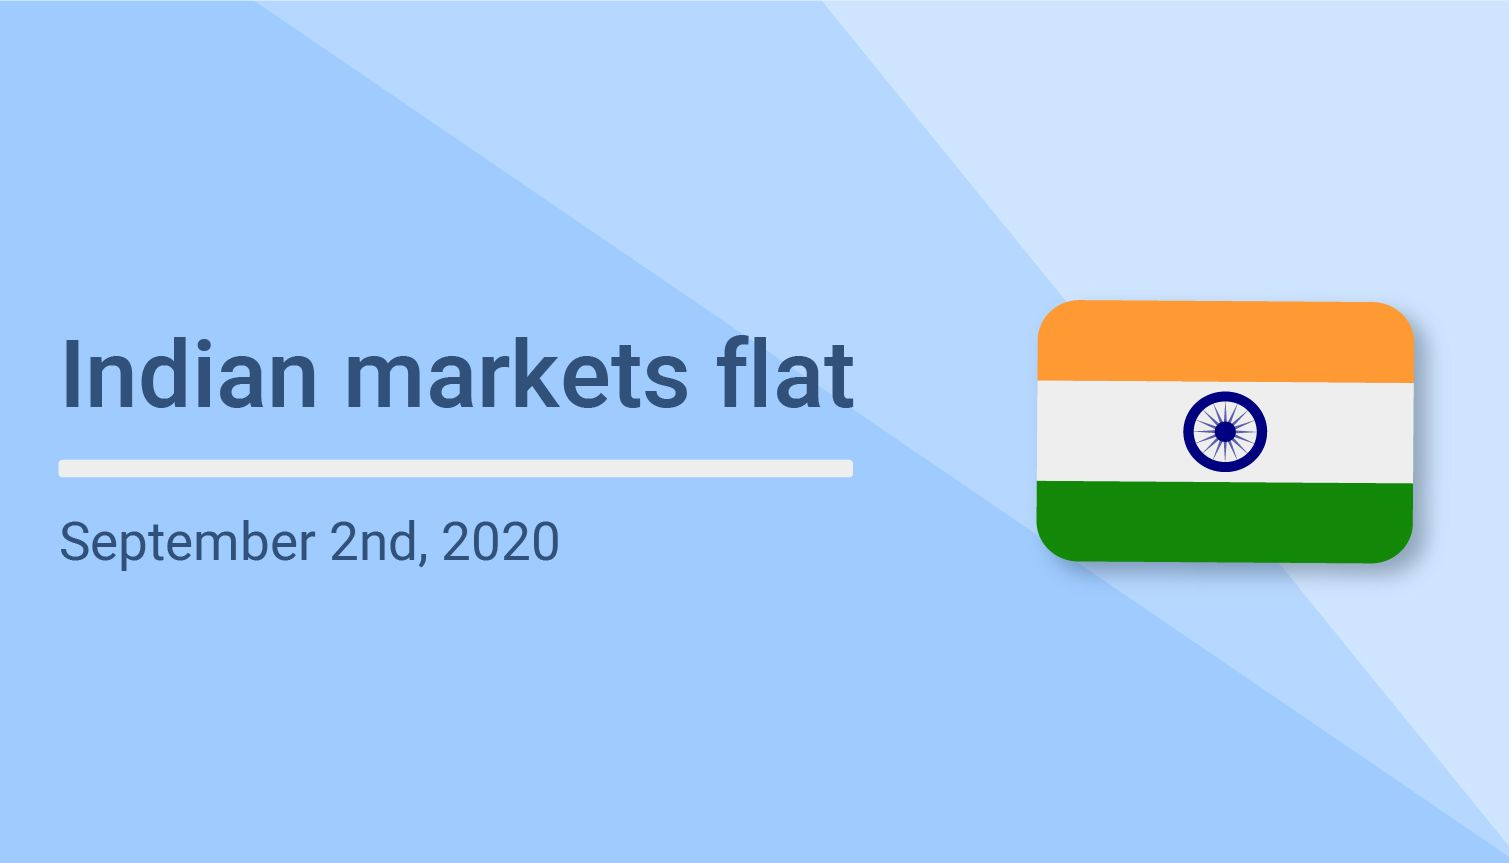 Indian markets going flat